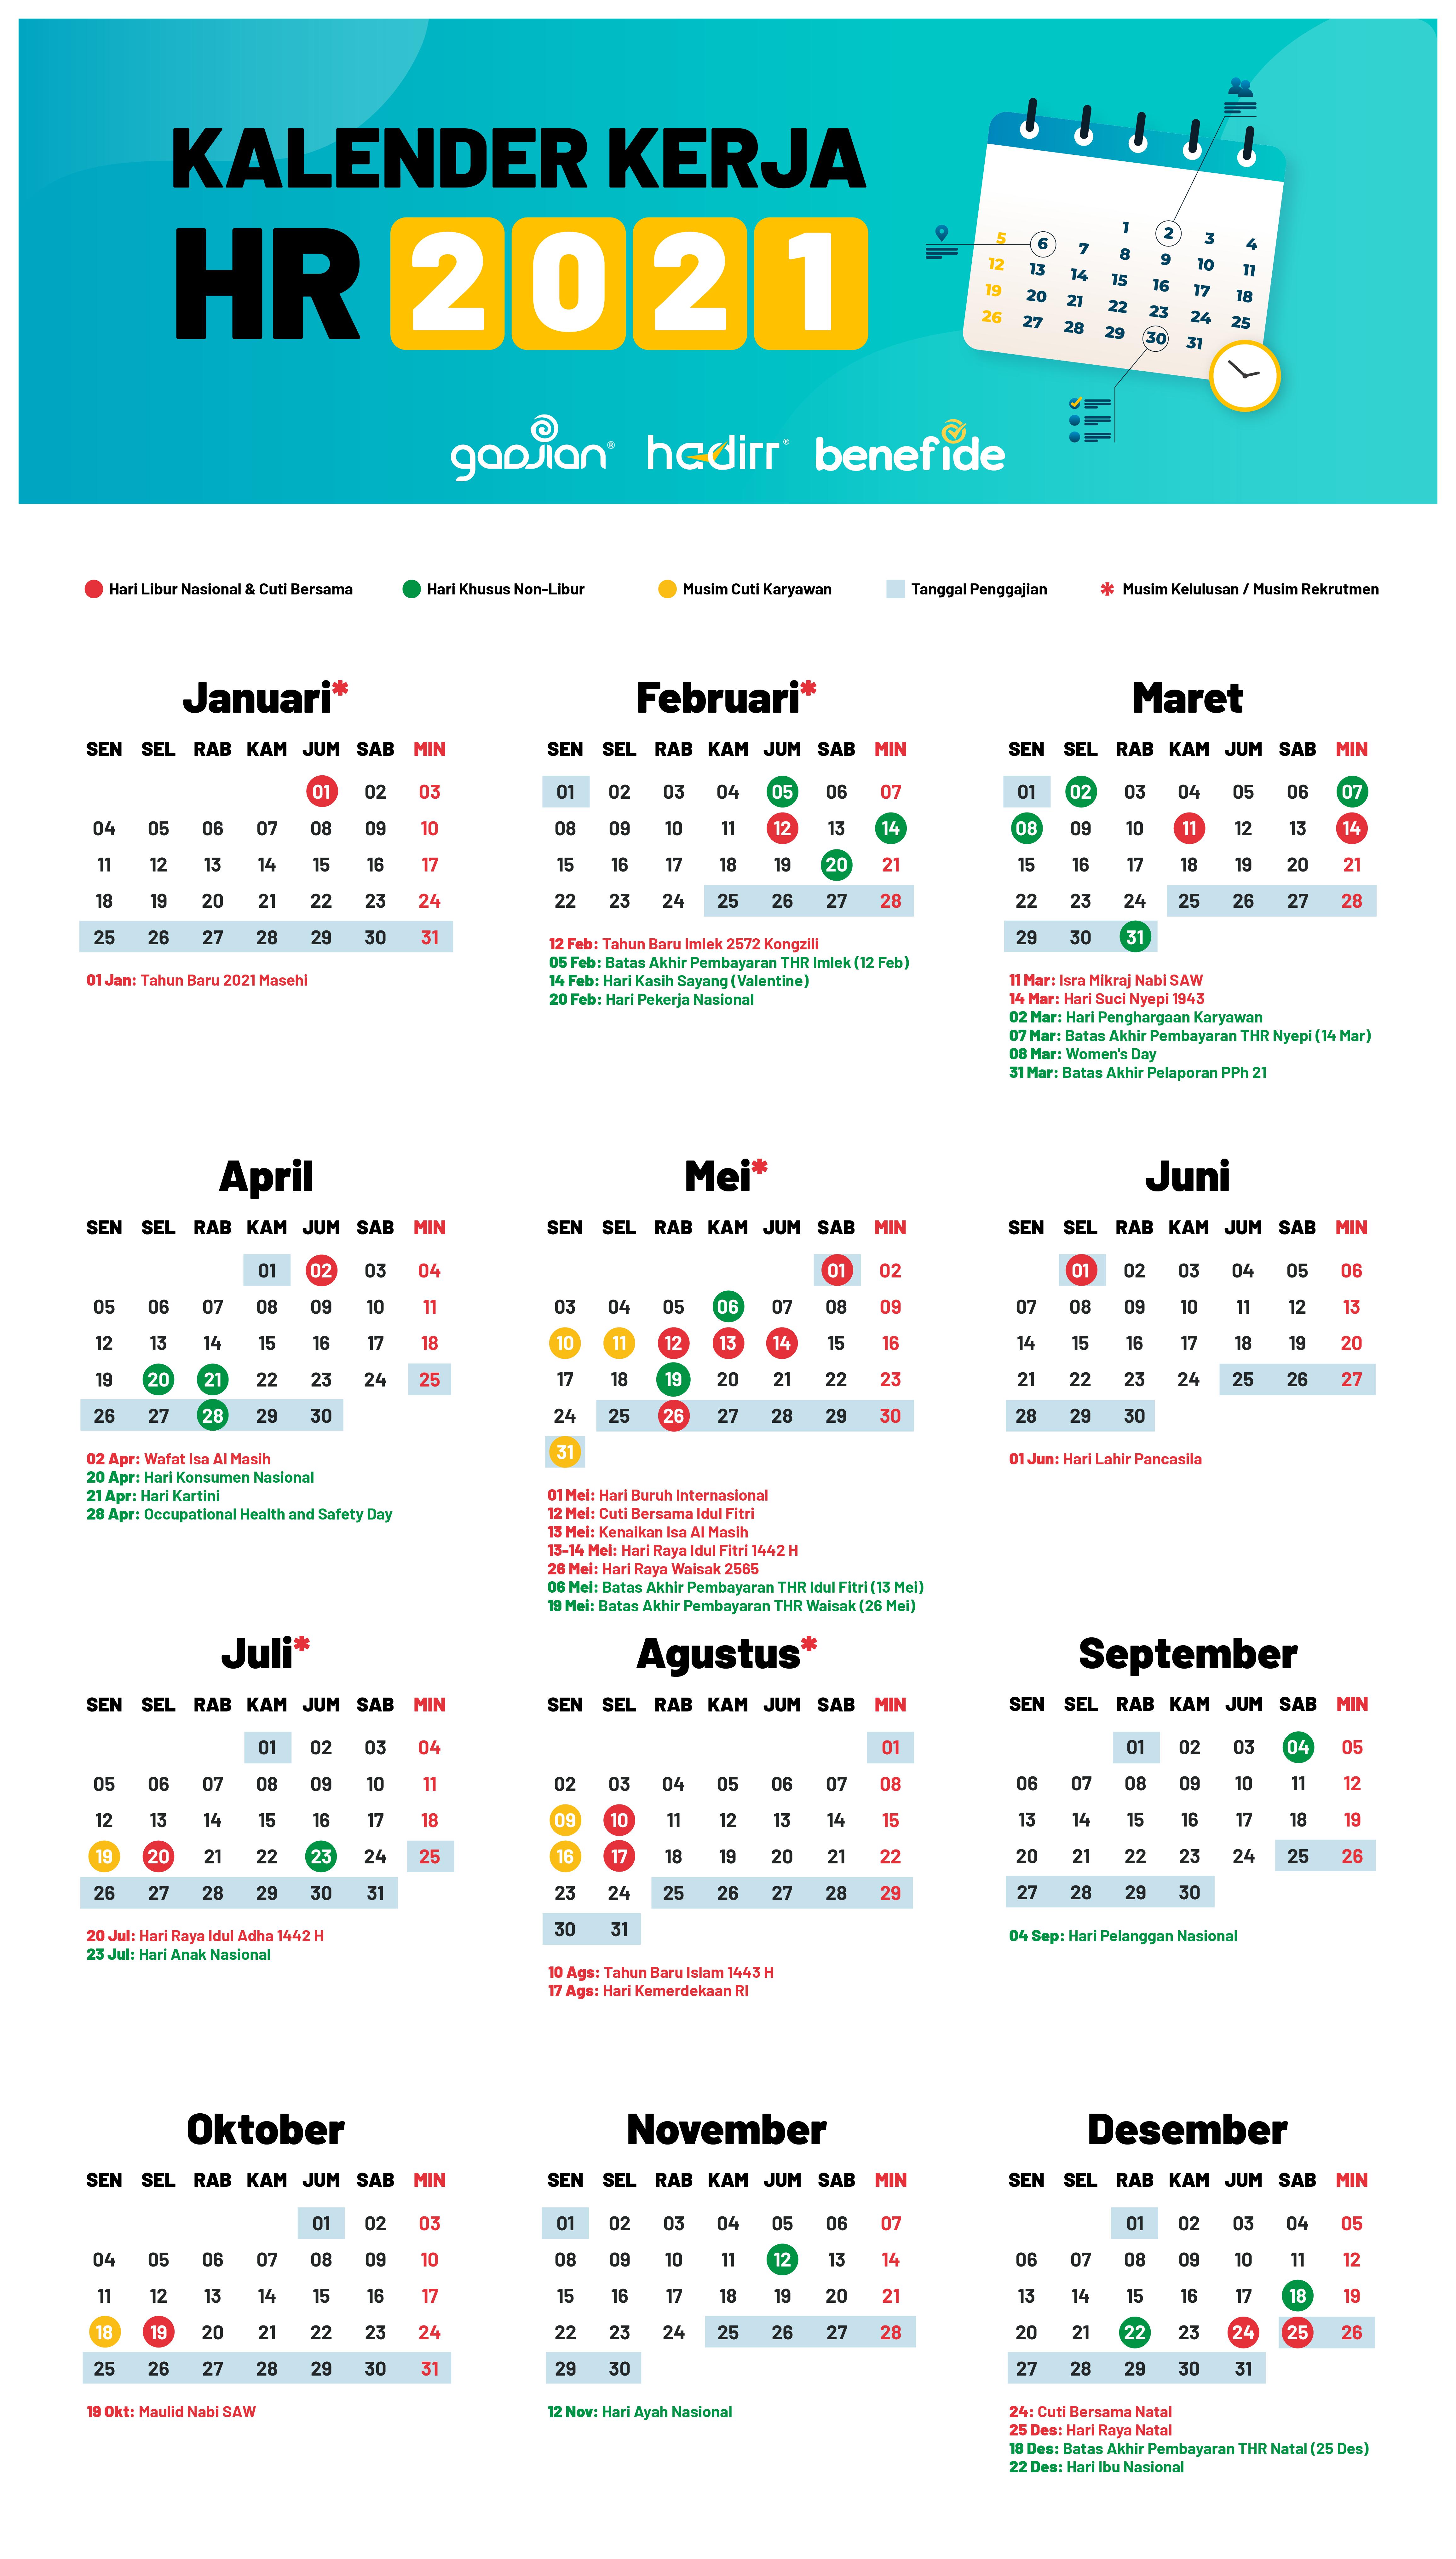 Kalender Hr 2021 Lengkap Dengan Jadwal Libur Dan Cuti Massal Karyawan Update Blog Gadjian